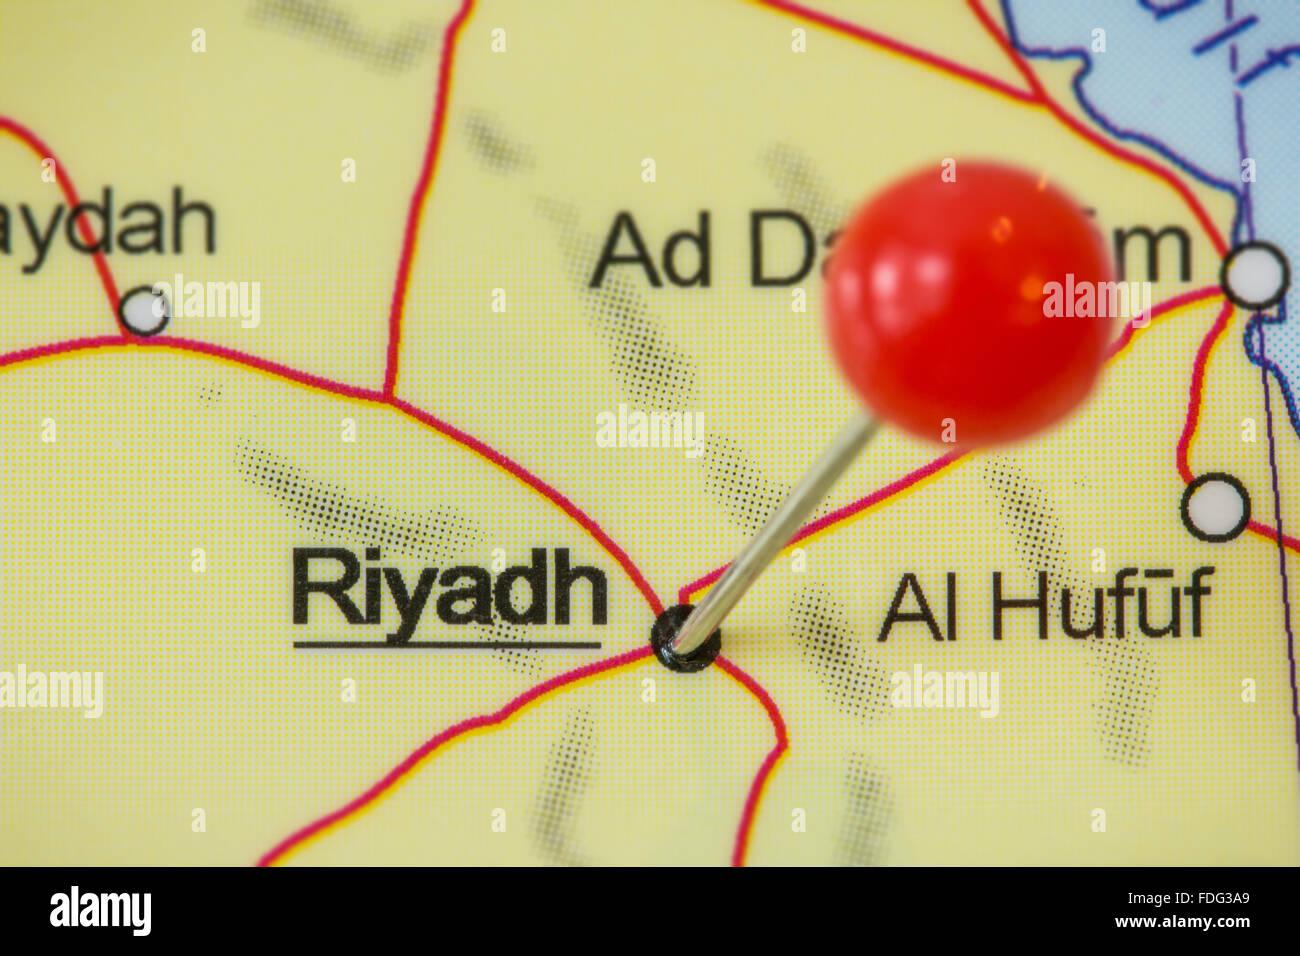 Close-up de una chincheta roja en un mapa de Riad, Arabia Saudita. Imagen De Stock